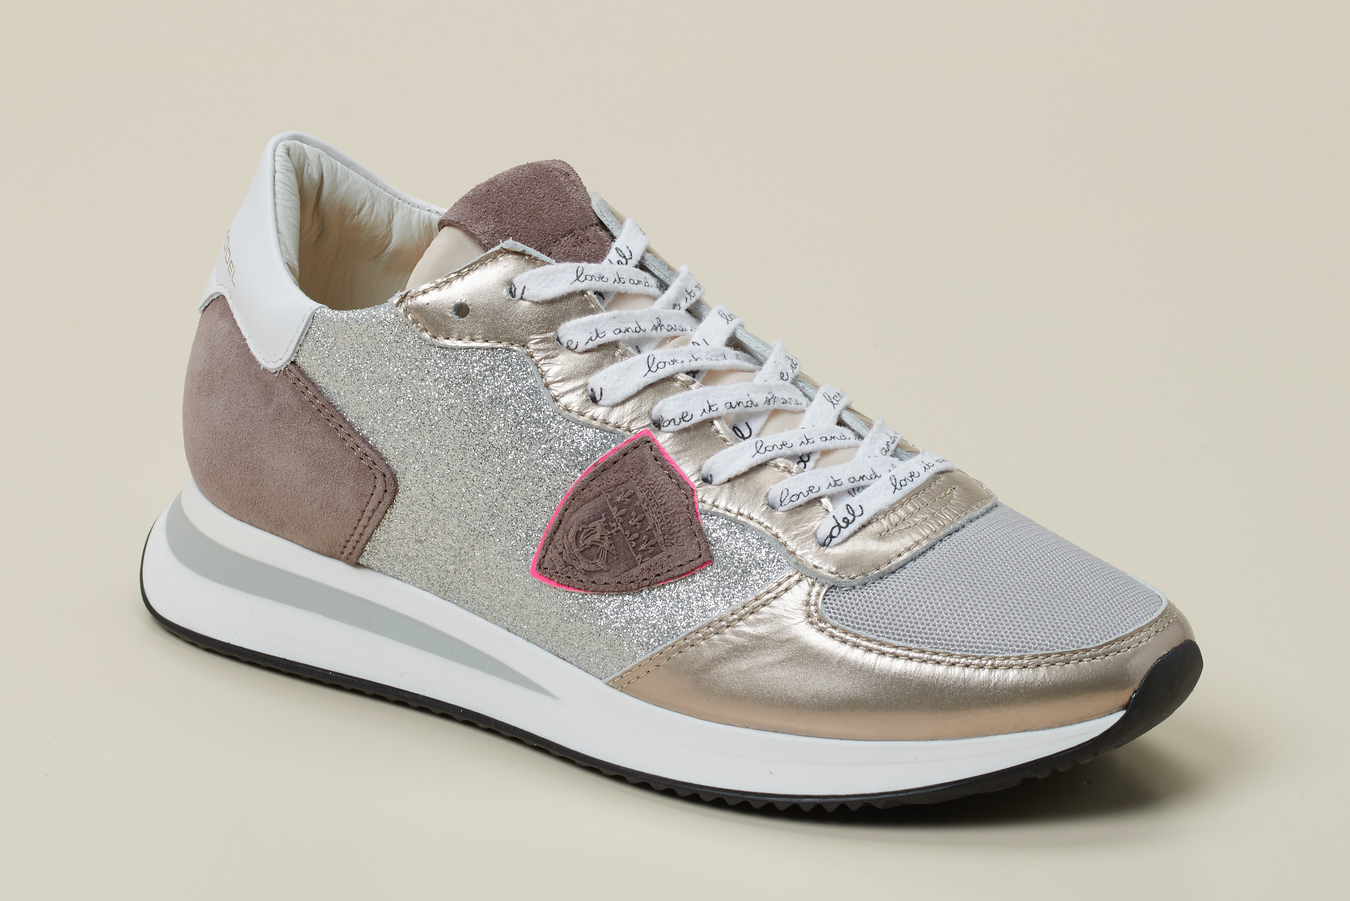 Philippe Model Paris Damen Sneaker in grau kaufen | Zumnorde Online Shop